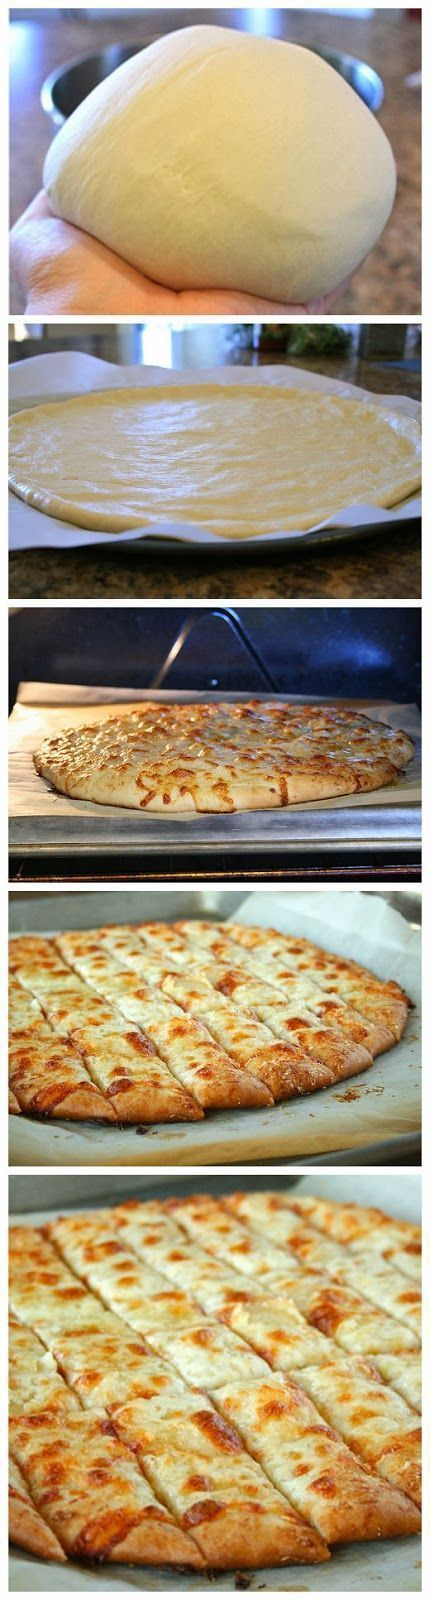 Fail-Proof Pizza Dough and Cheesy Garlic Bread Sticks | Lauren's Latest